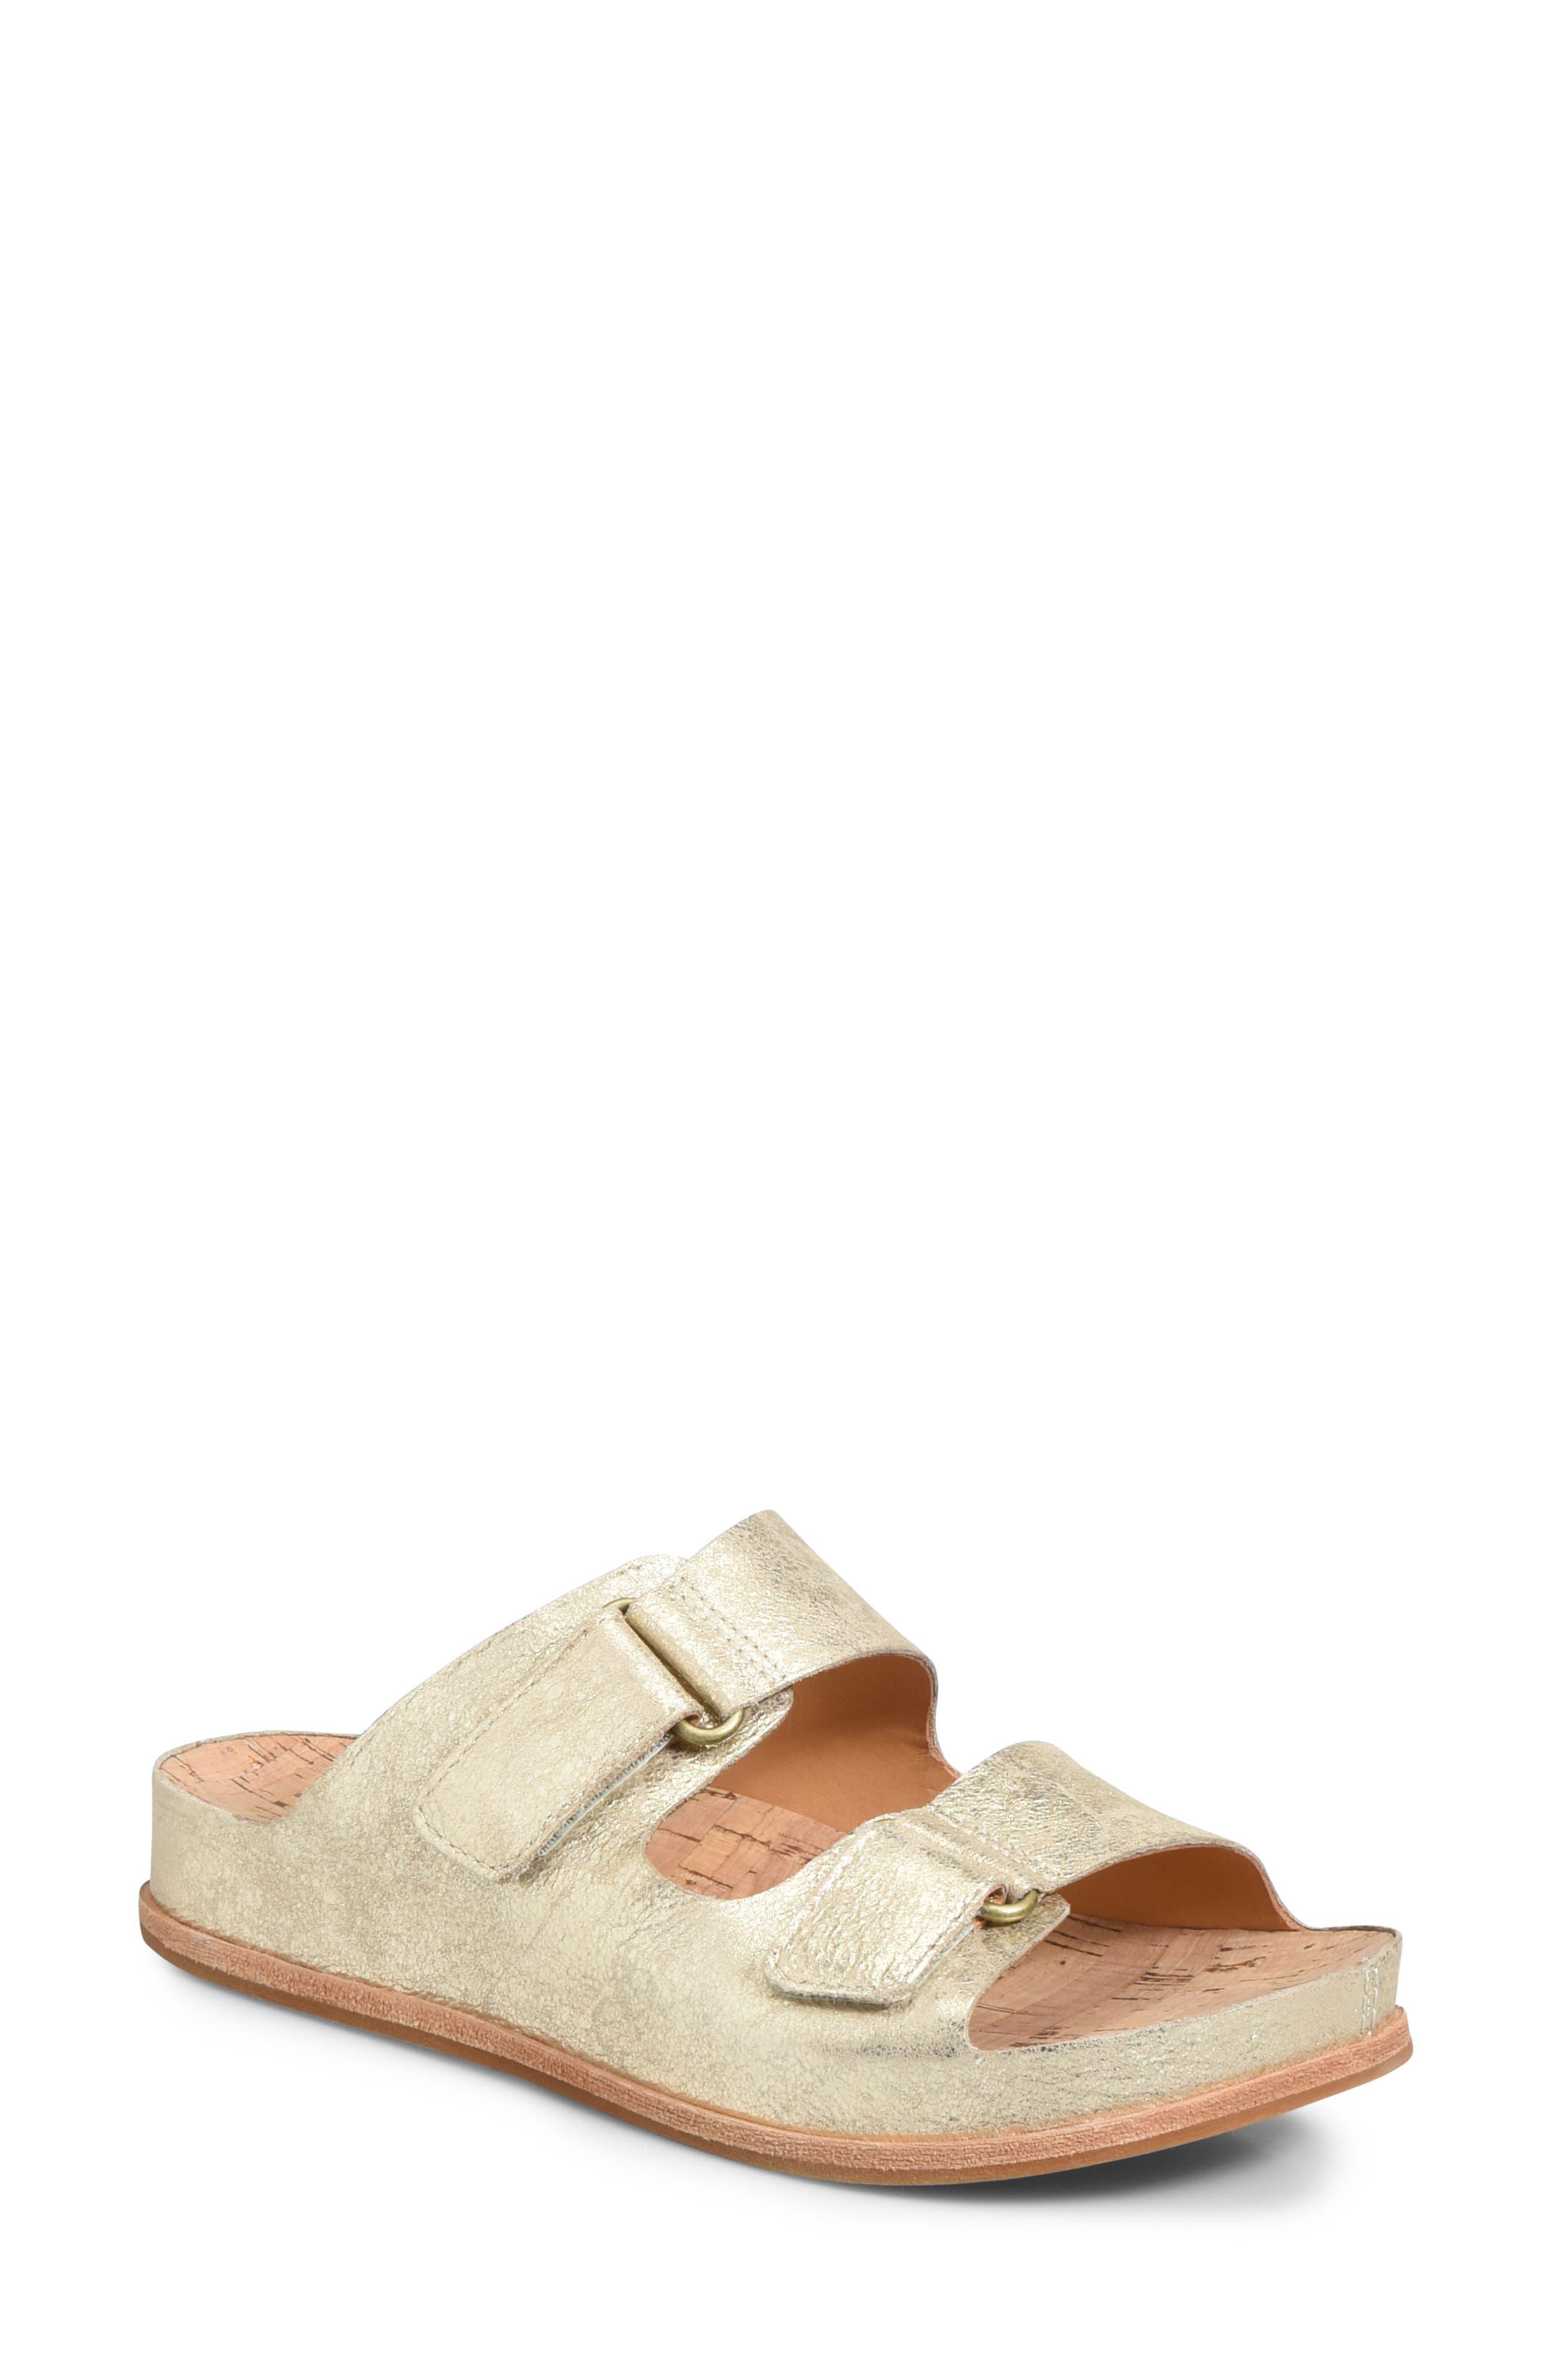 Kork-Ease Torreya Slide Sandal, Metallic